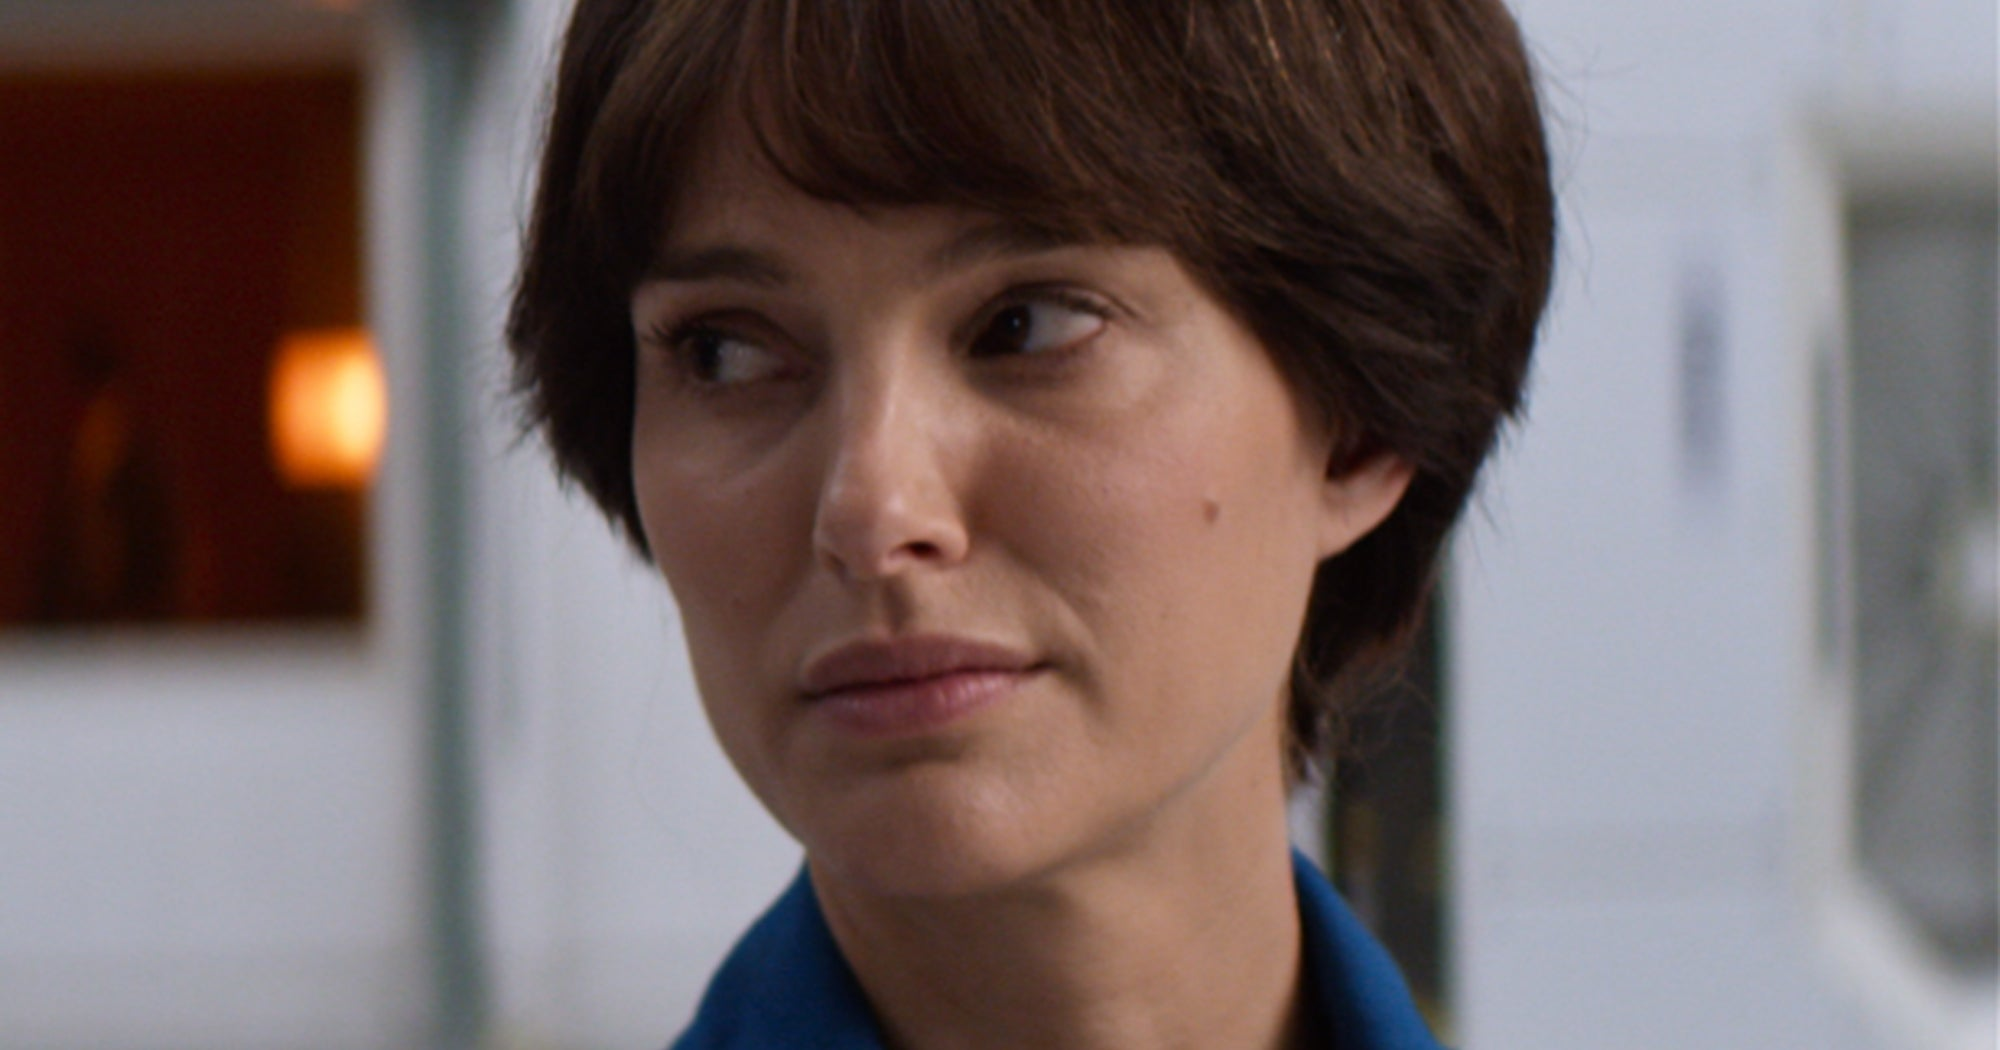 Natalie Portman's Astronaut Movie Shouldn't Be Boring. But It Is.